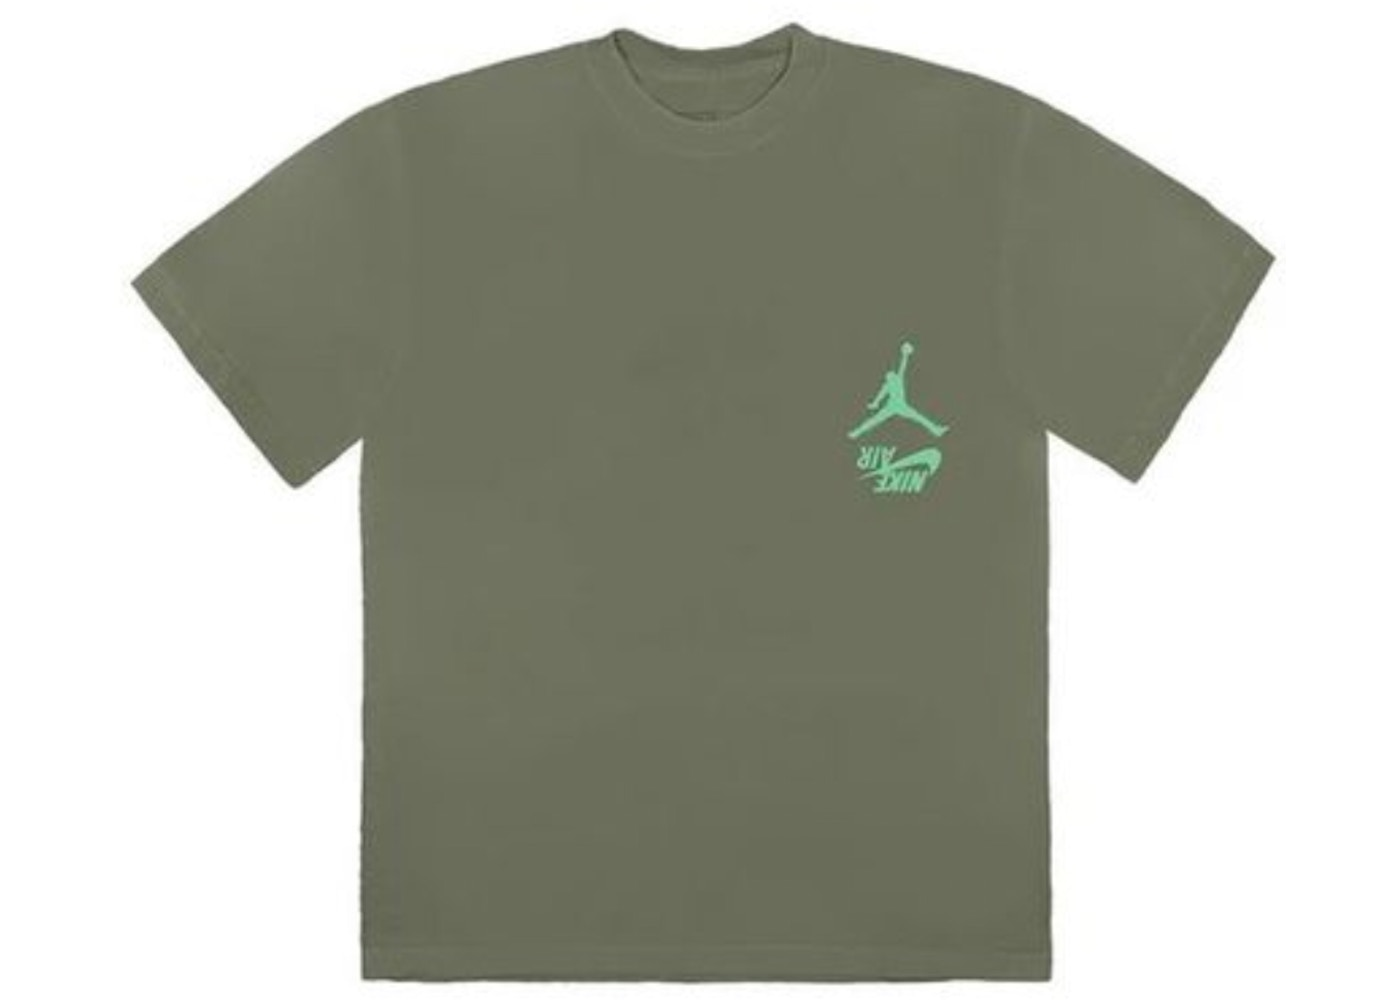 Travis Scott Jordan Cactus Jack Highest T Shirt Olive Fw19